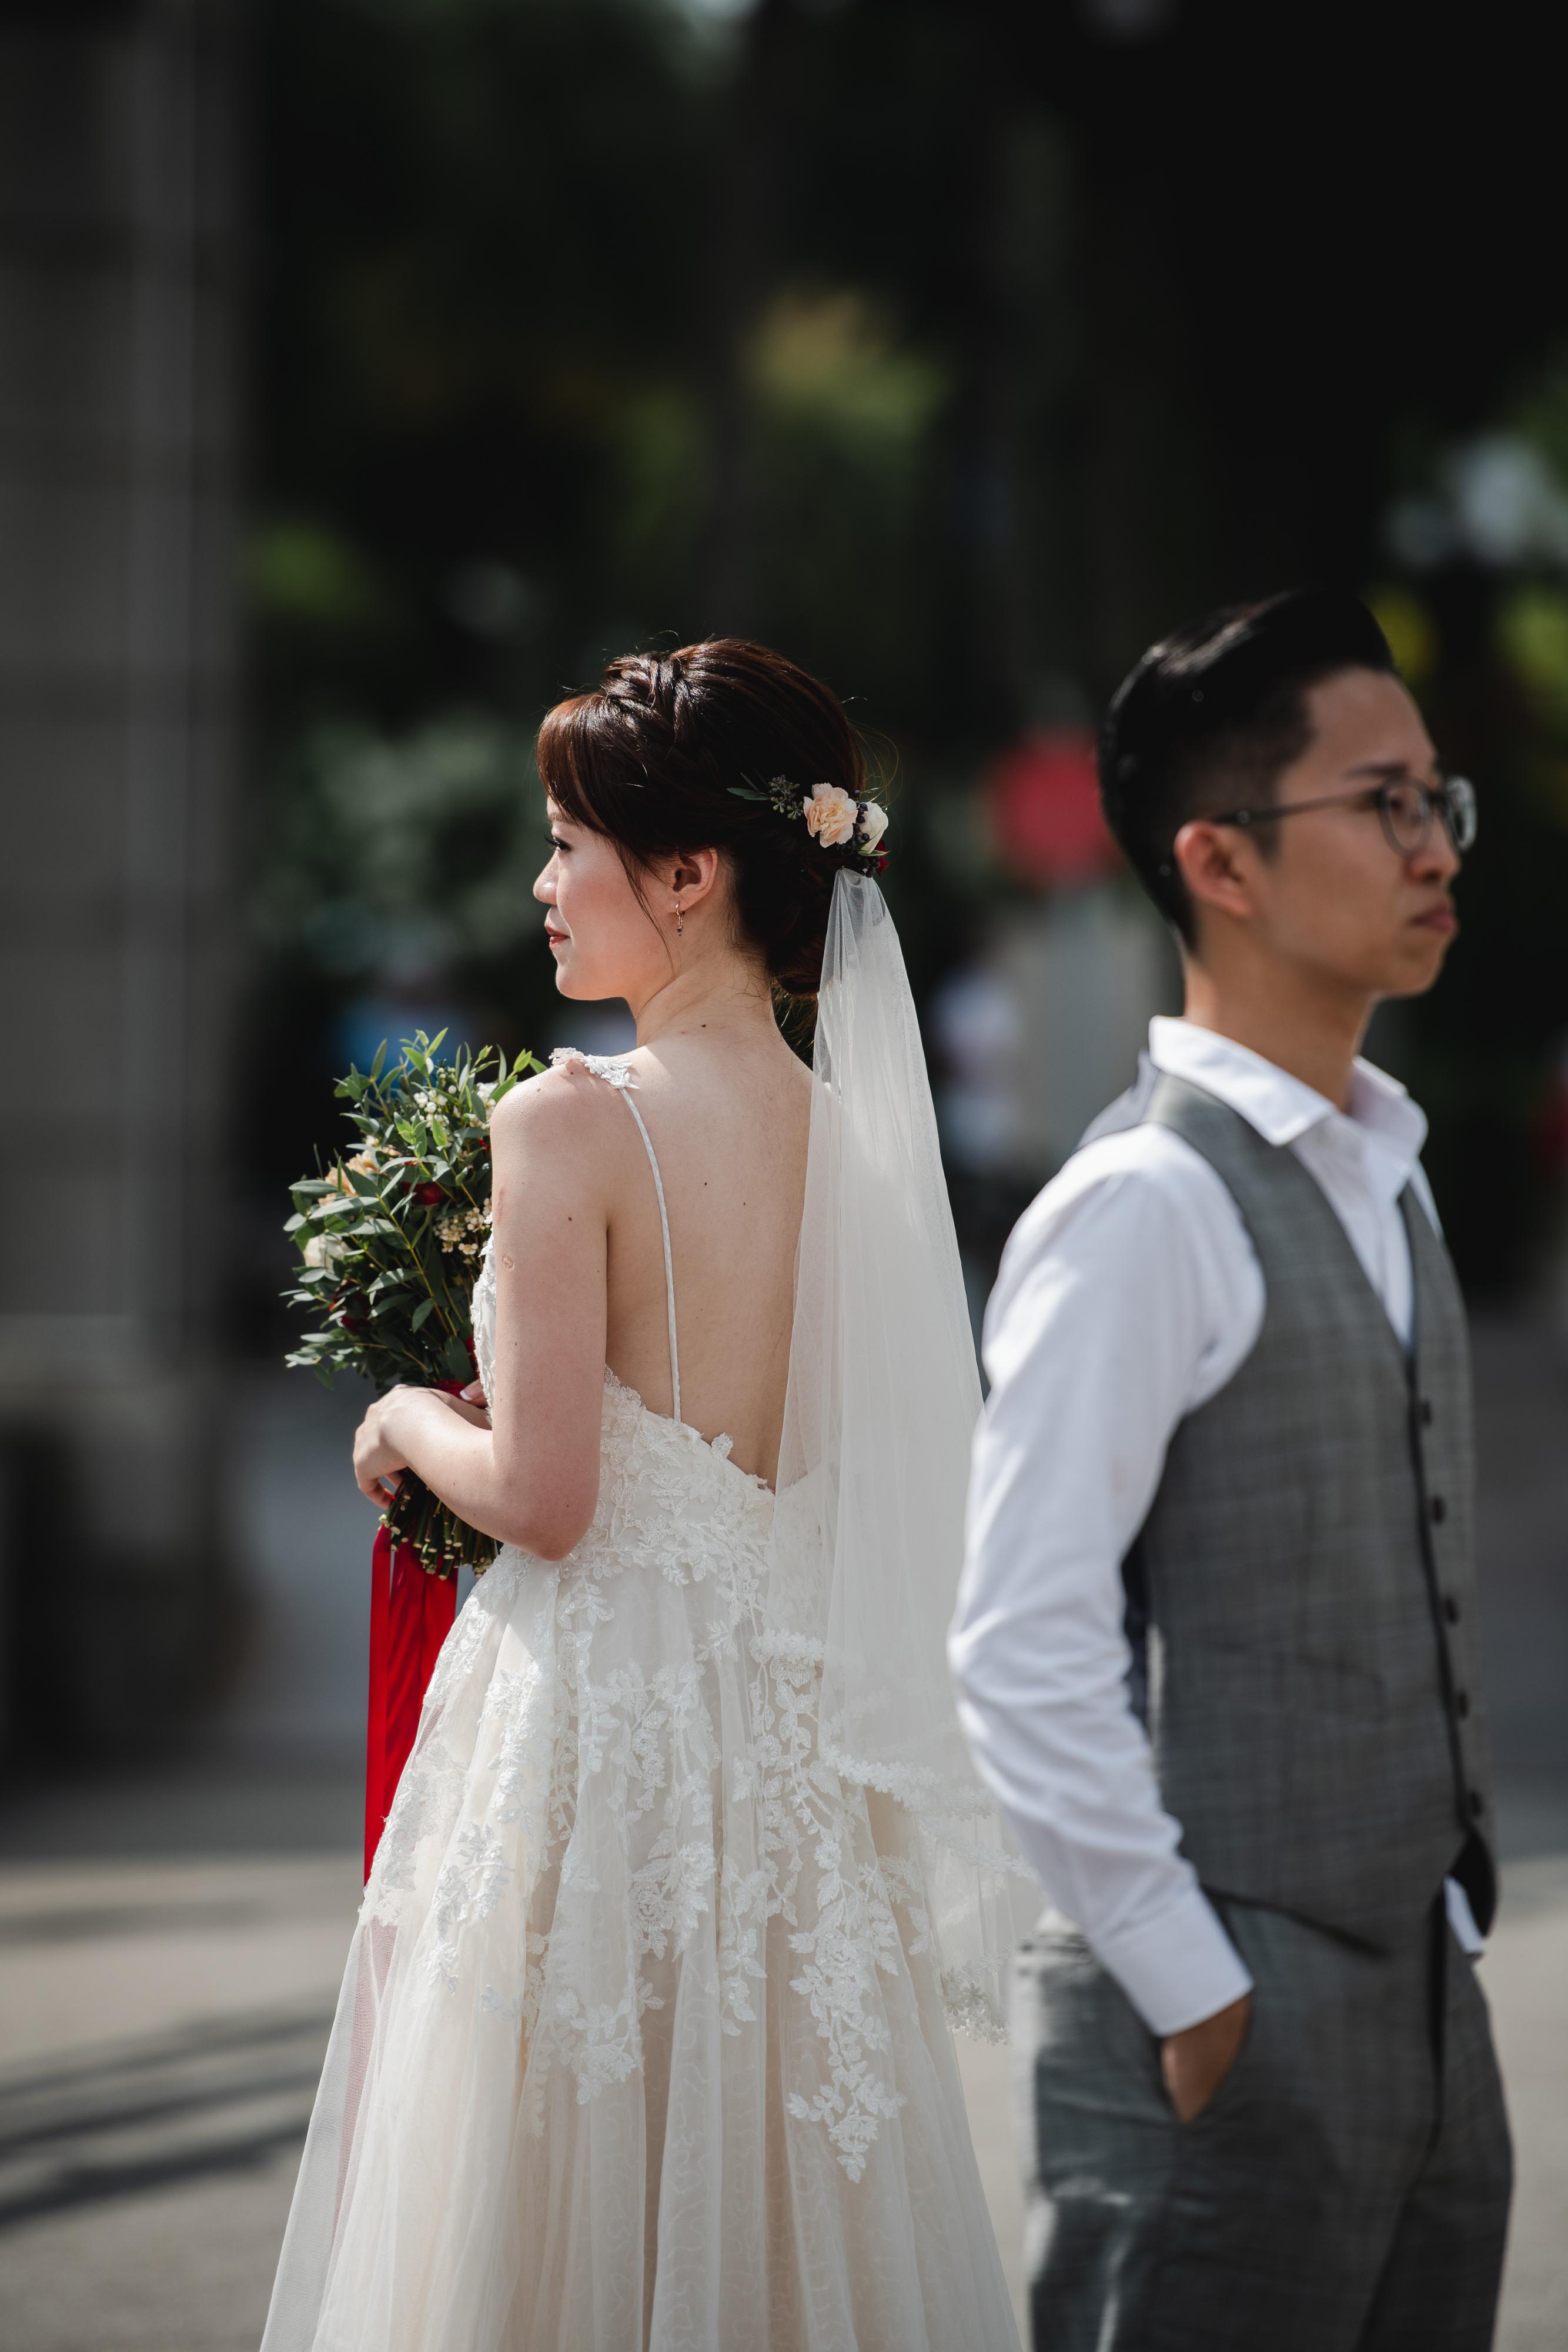 Kai Sun & Wen Jing - 238